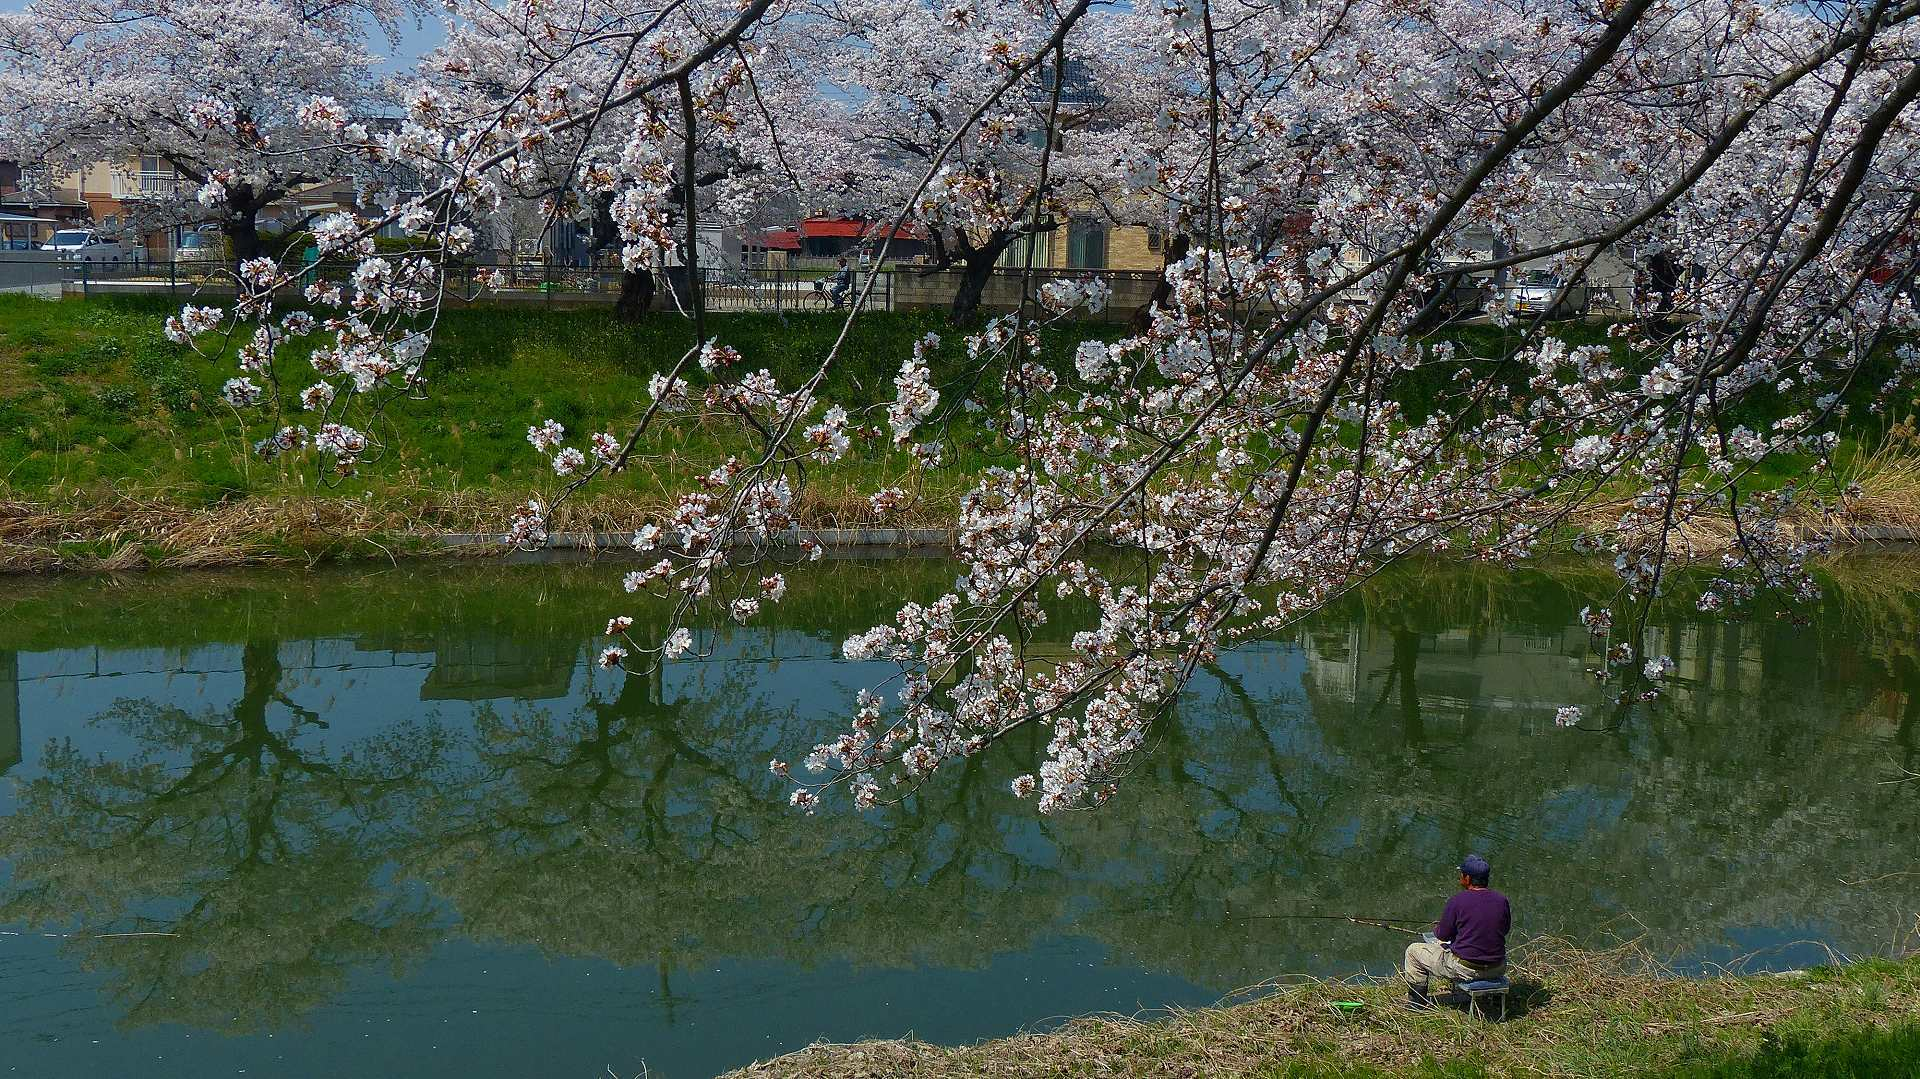 満開の桜を堪能! 【 2018 3/28(水) 】_a0185081_19302709.jpg